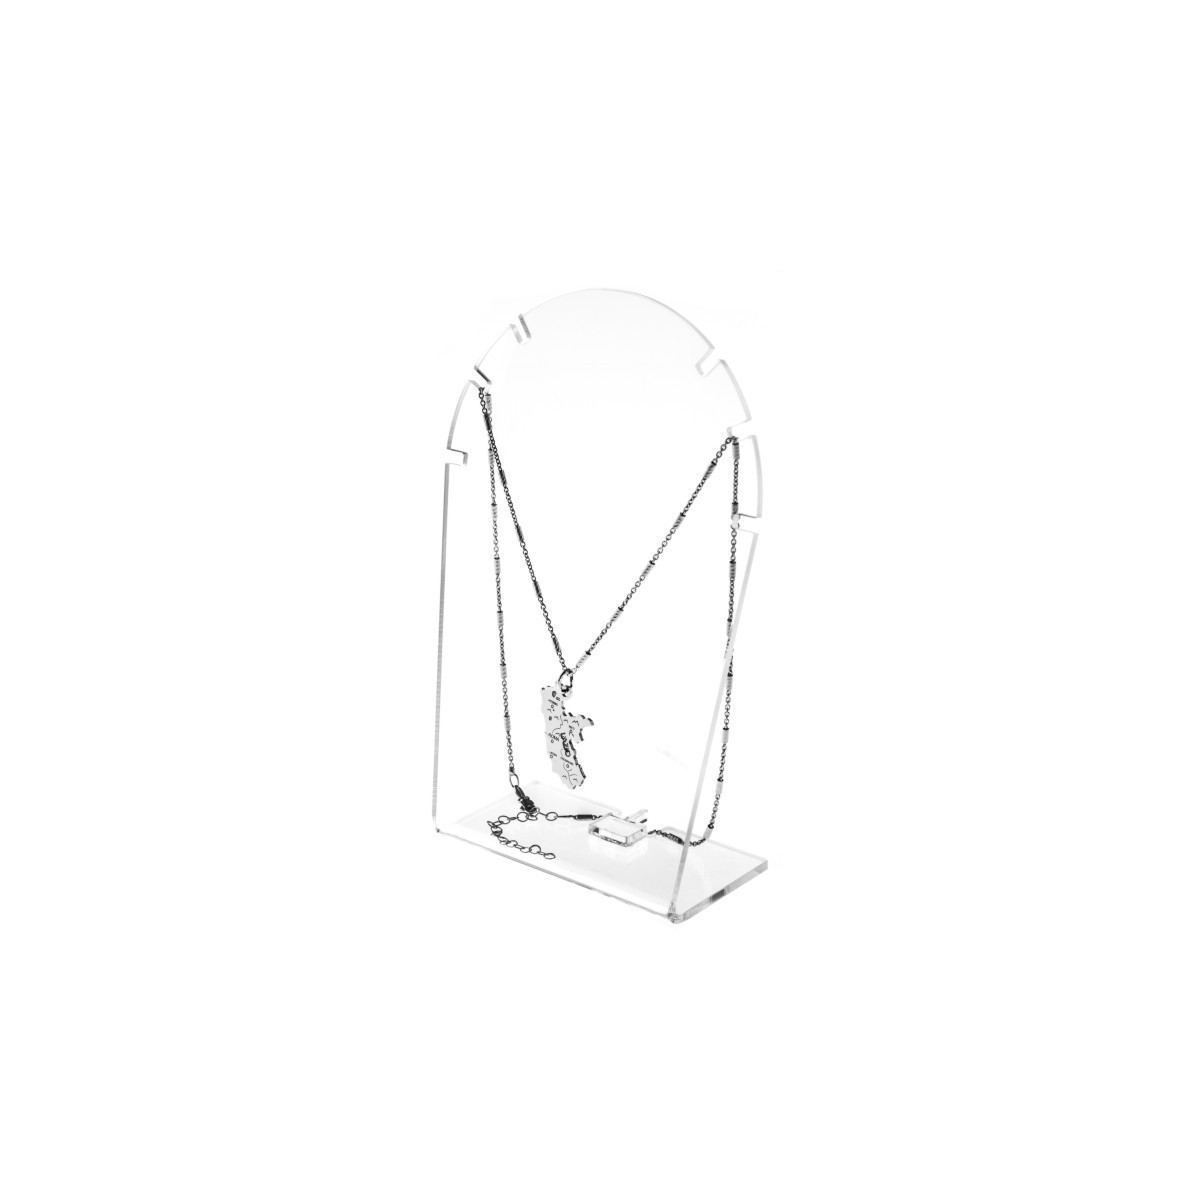 Expositor de mostrador para collares en plexiglás transparente